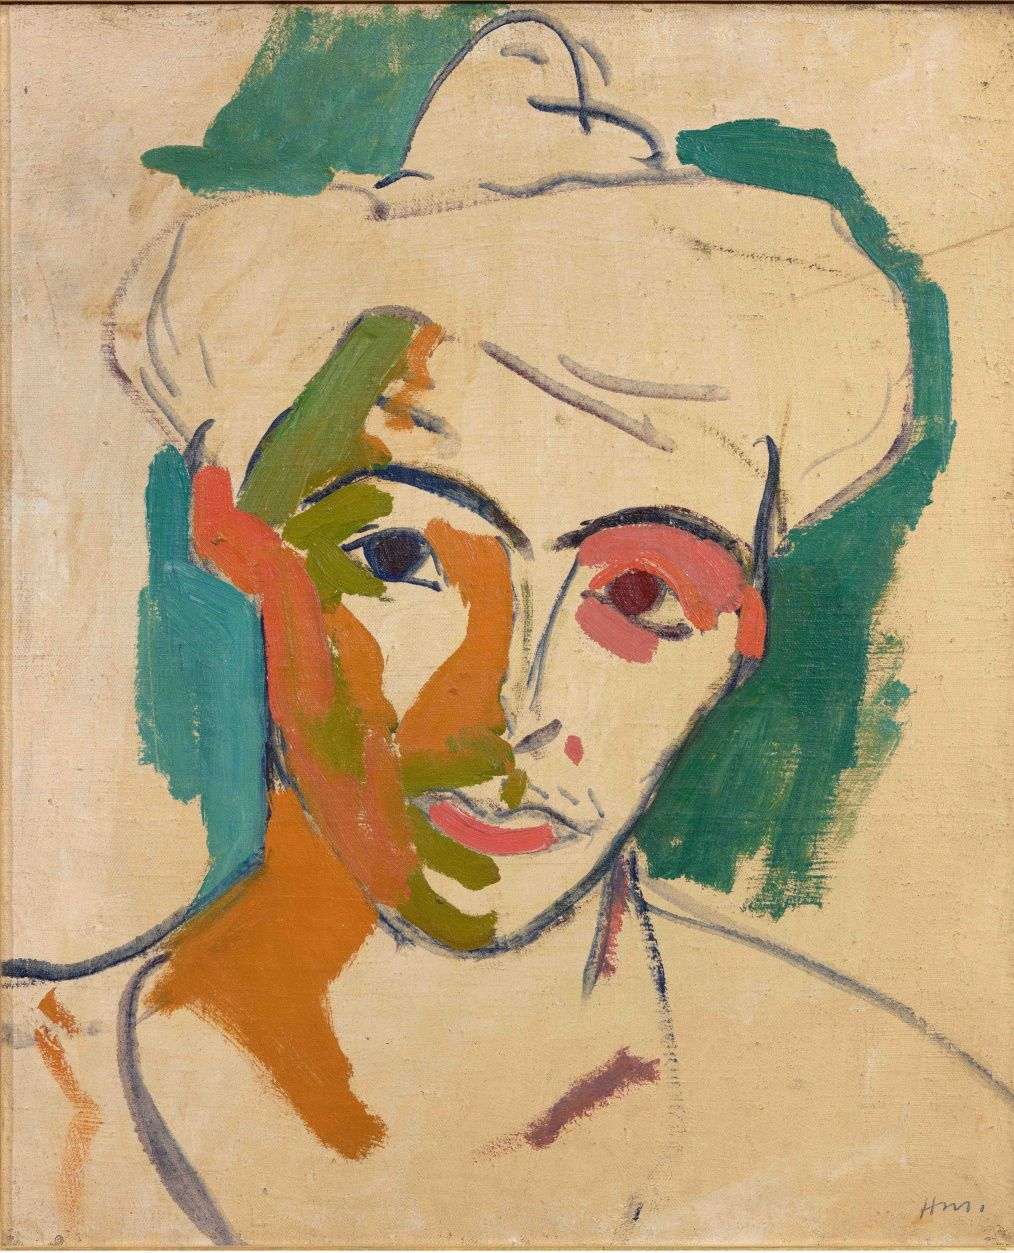 Henri Matisse (French, Fauvism, 1869-1954). 1905, Portrait de madame Matisse, Collioure